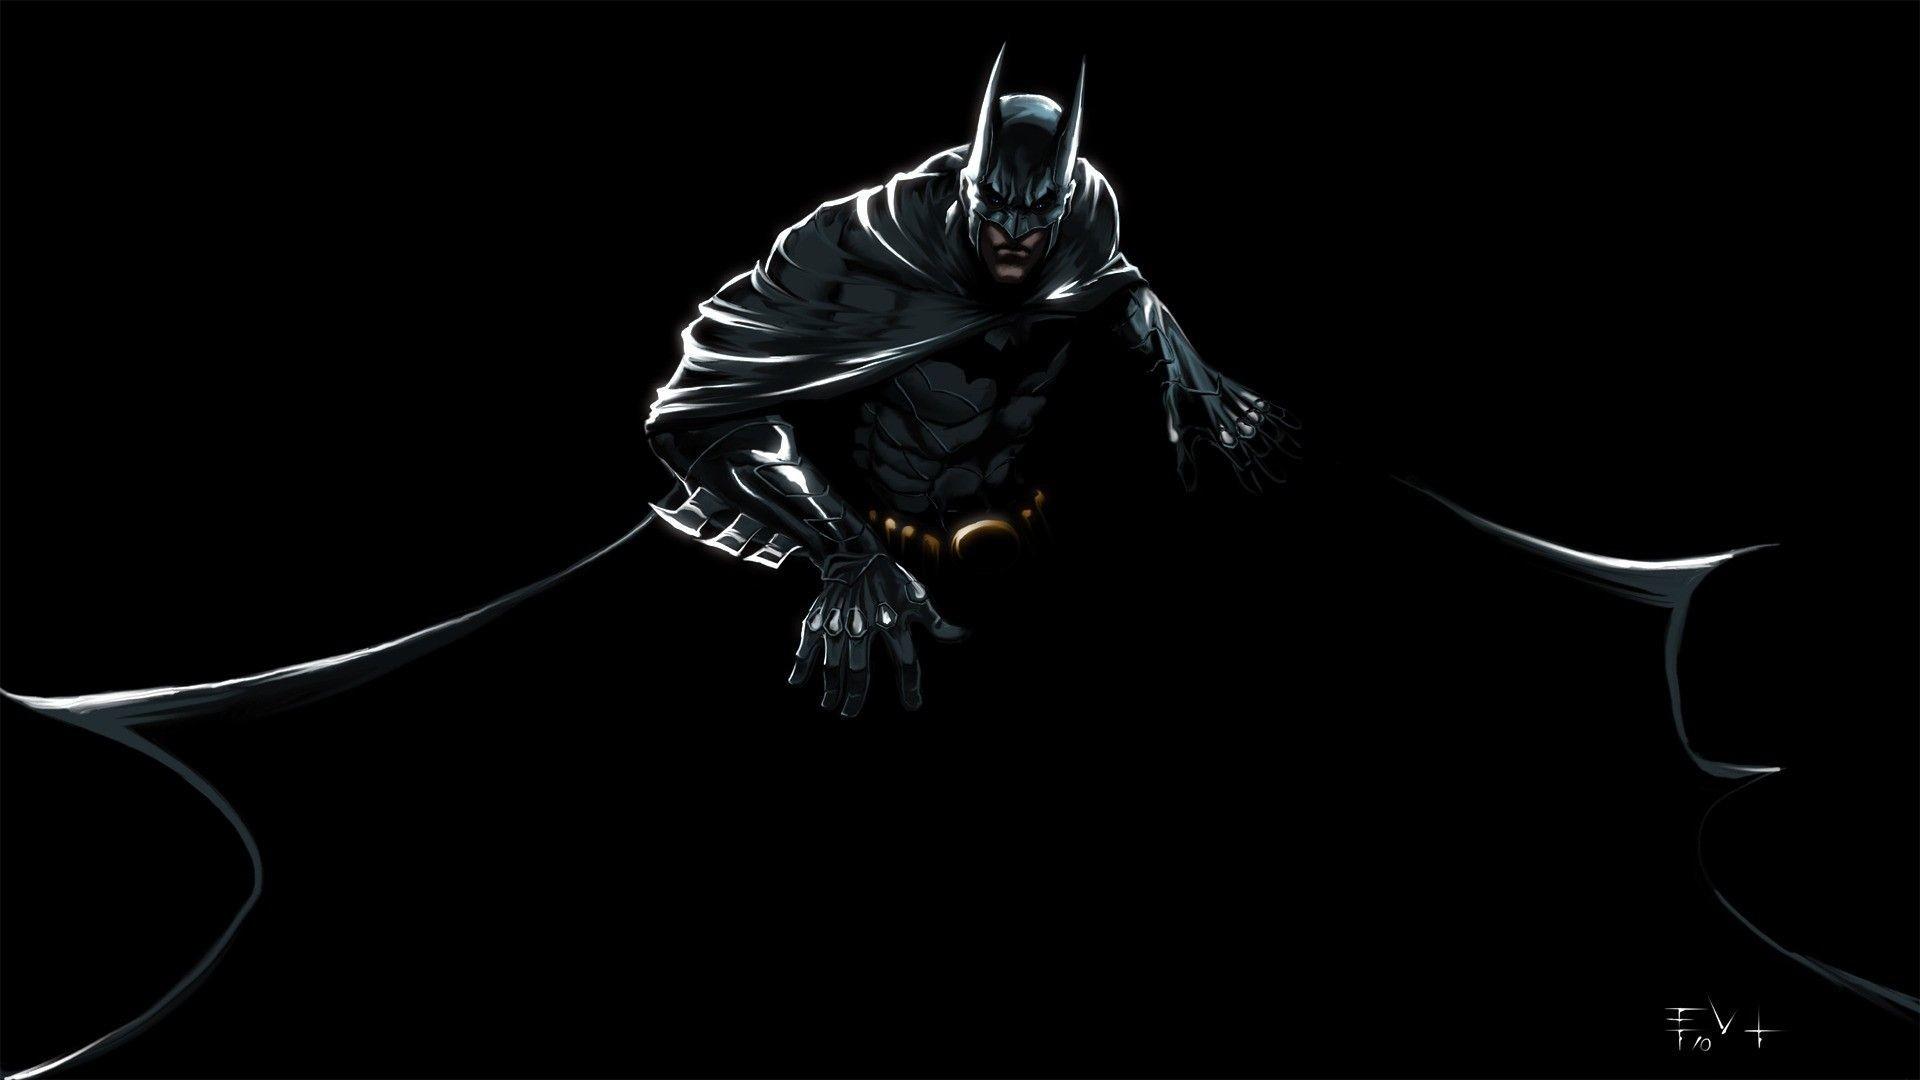 … fiction wallpaper hd batman comics wallpapers for android at …